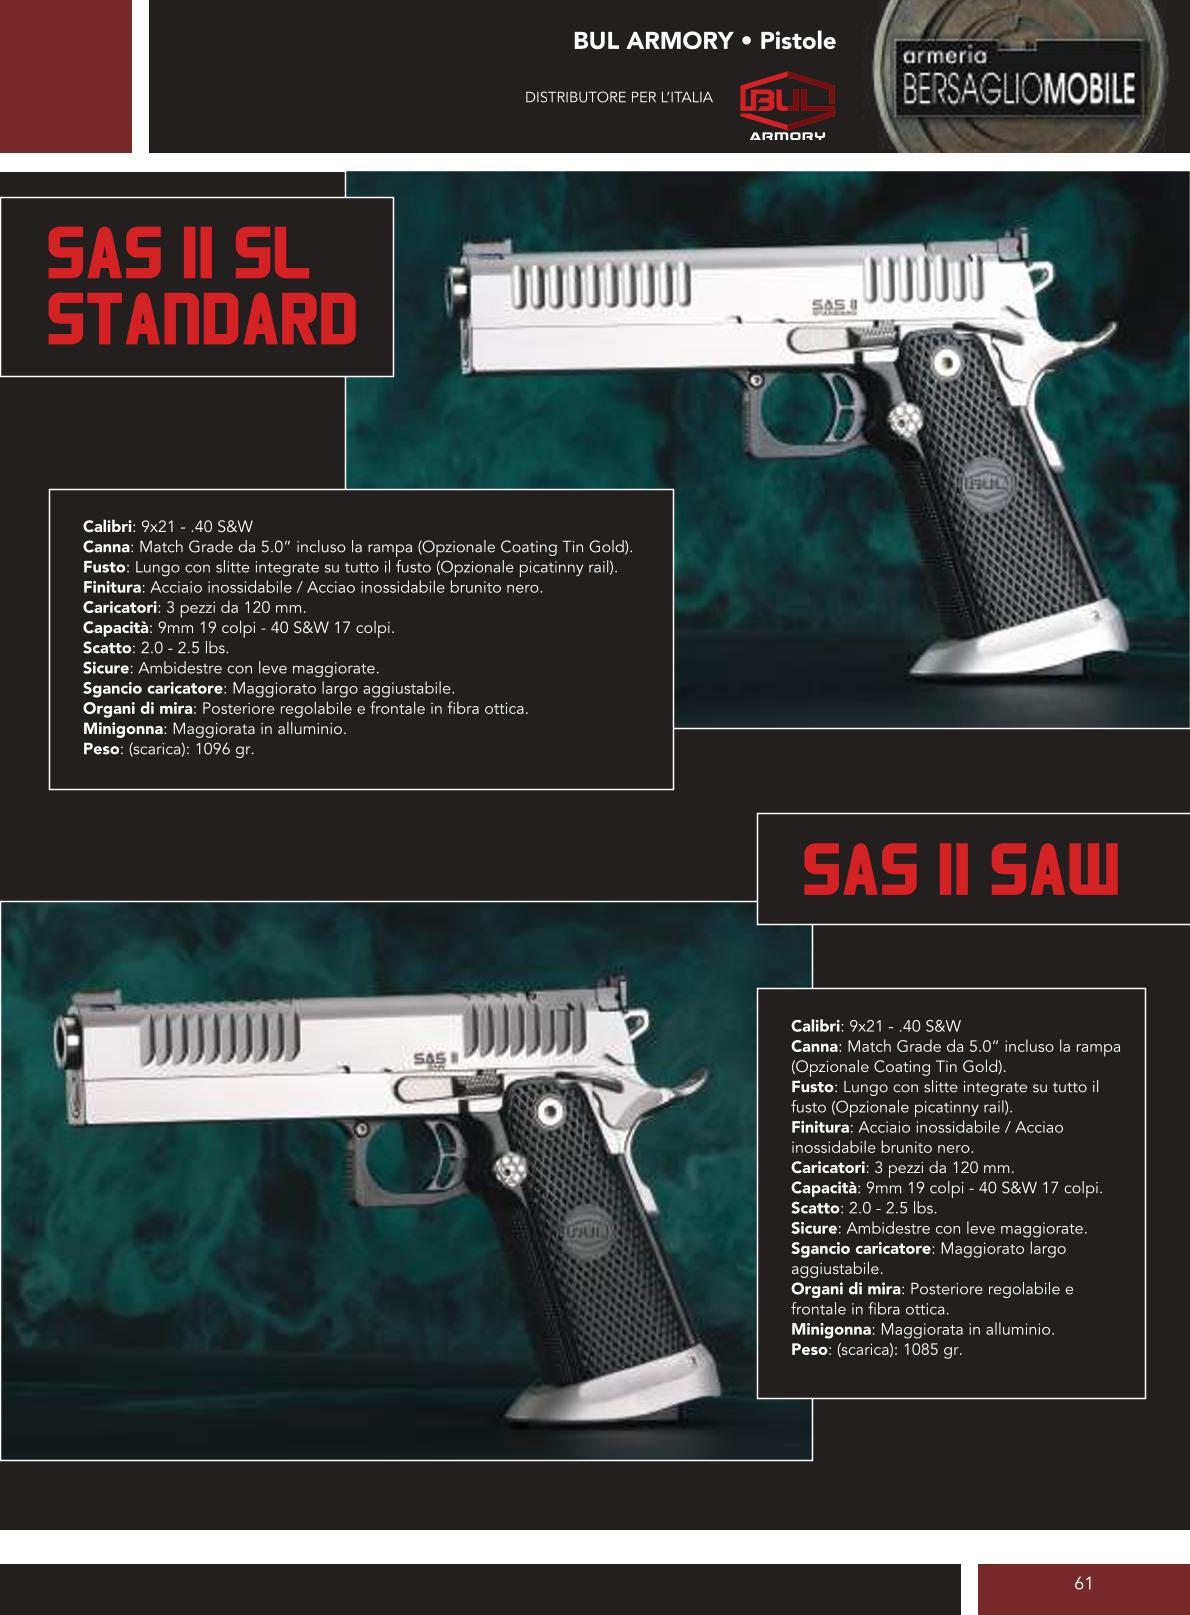 Bul Armory - Sas II SL Standard - Sas II Saw - Armeria Bersaglio Mobile